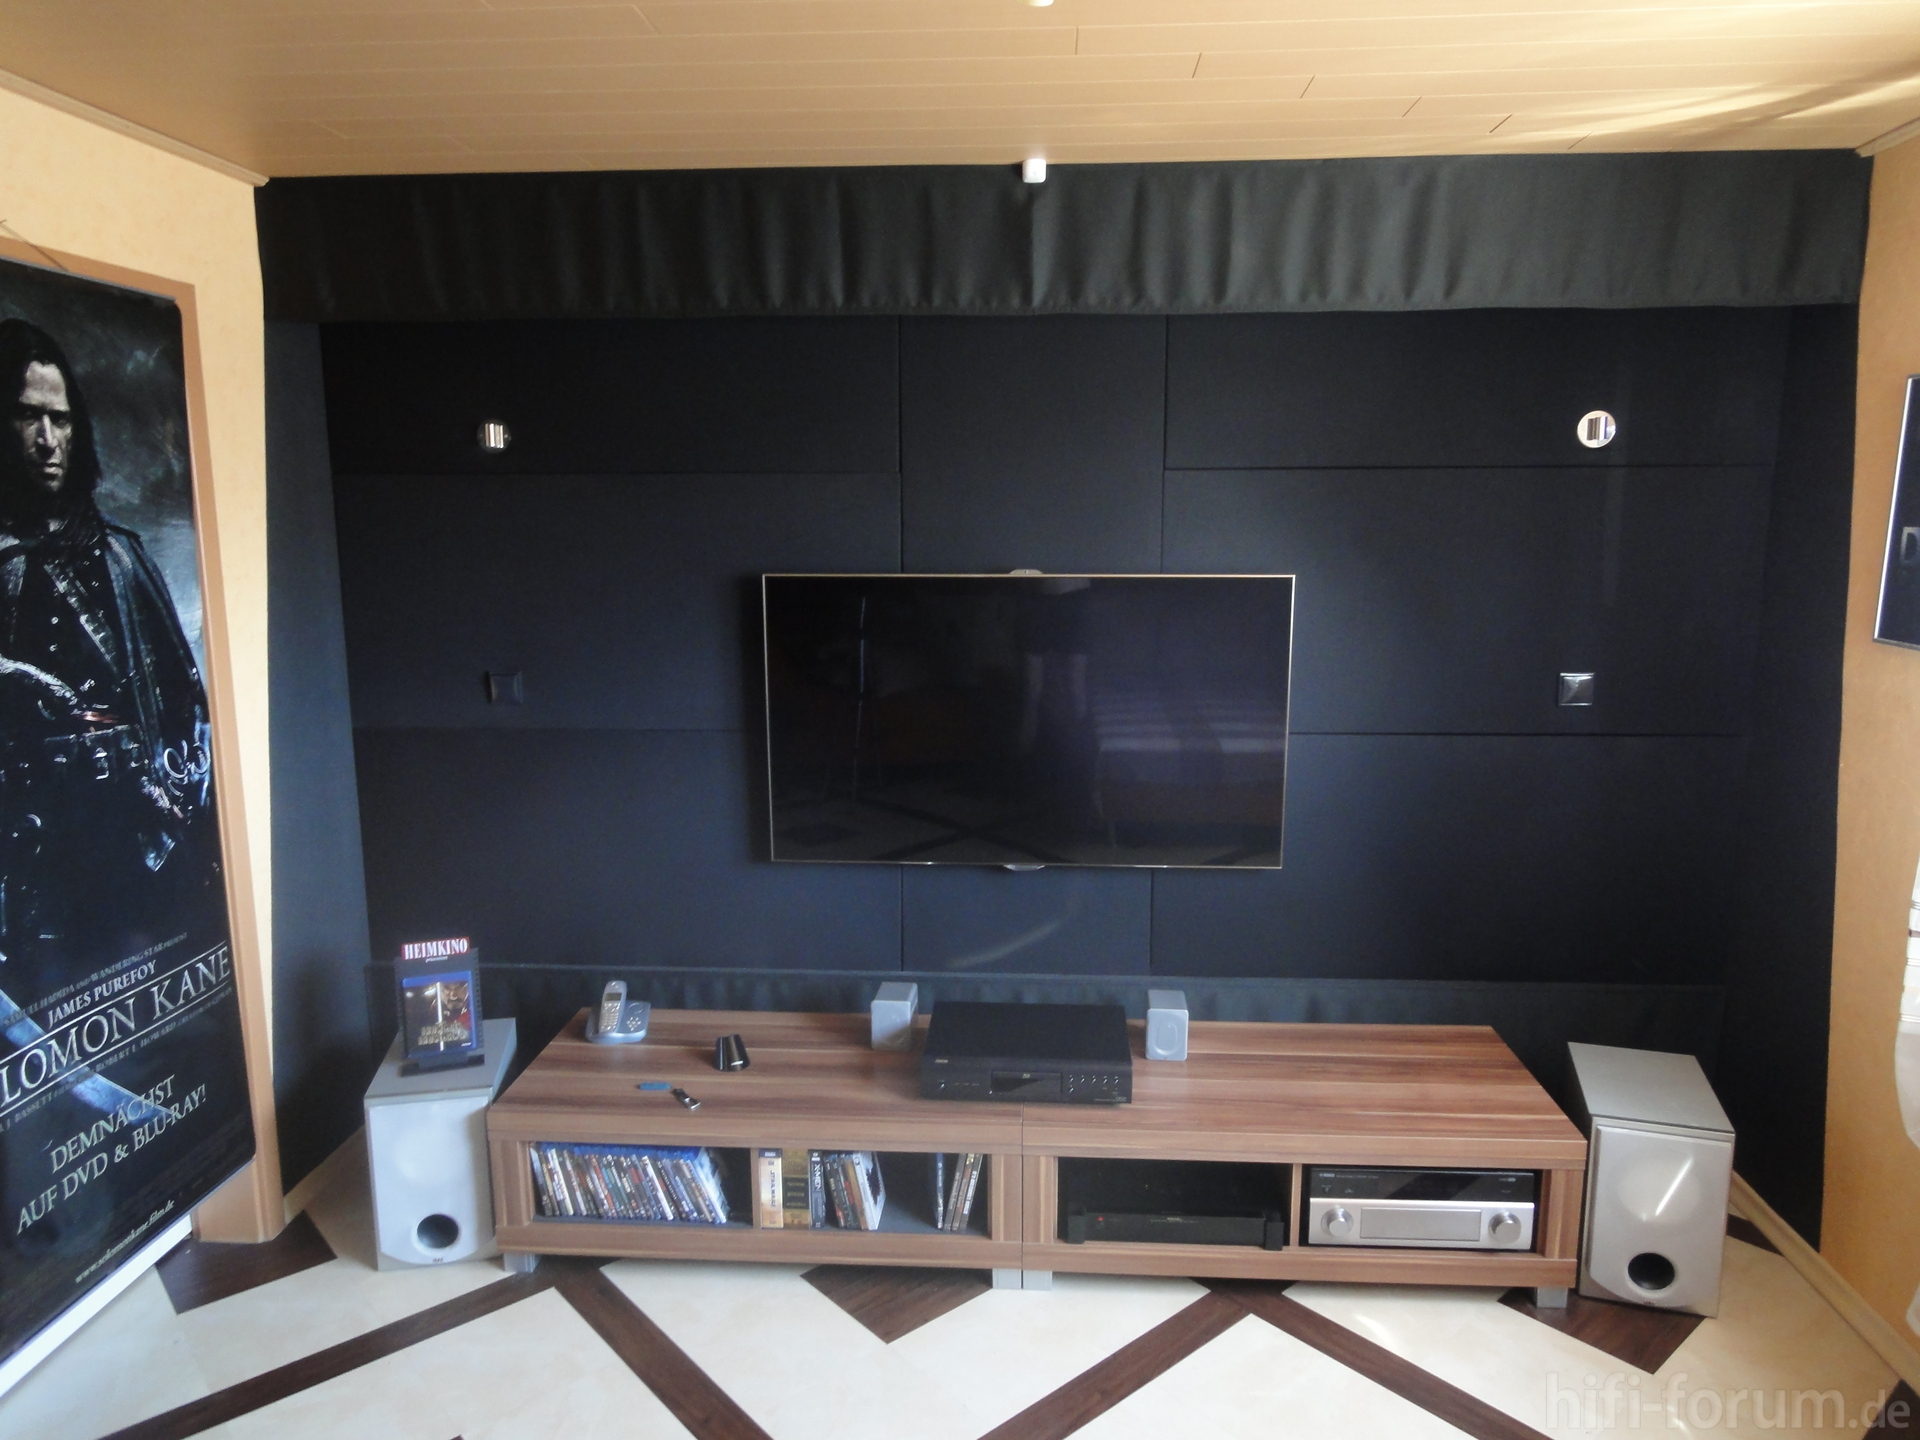 frontansicht frontansicht hifi bildergalerie. Black Bedroom Furniture Sets. Home Design Ideas